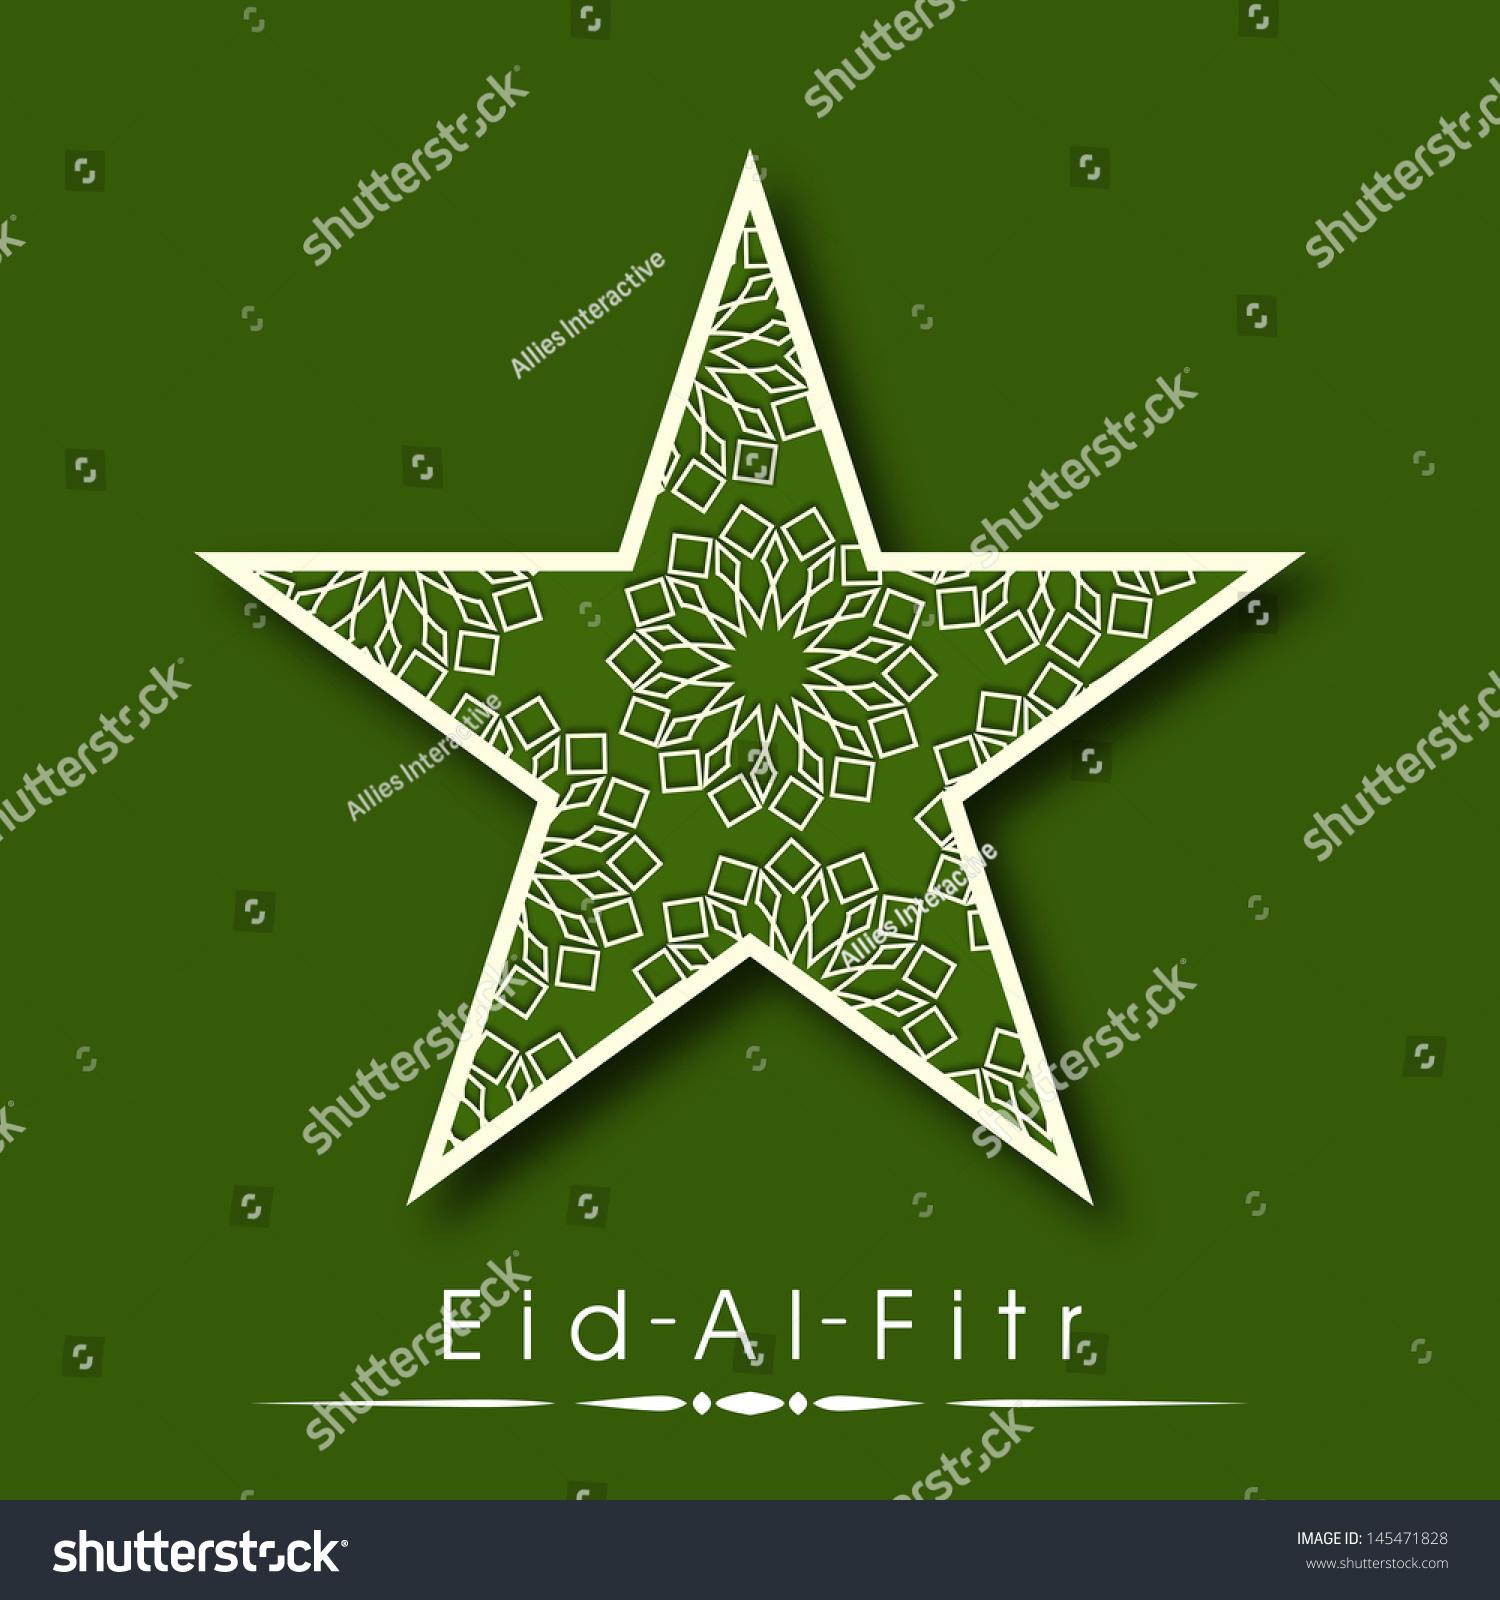 Amazing Hajj Eid Al-Fitr Decorations - stock-vector-muslim-community-festival-eid-al-fitr-eid-mubarak-background-with-decorated-star-on-green-145471828  Pic_96336 .jpg